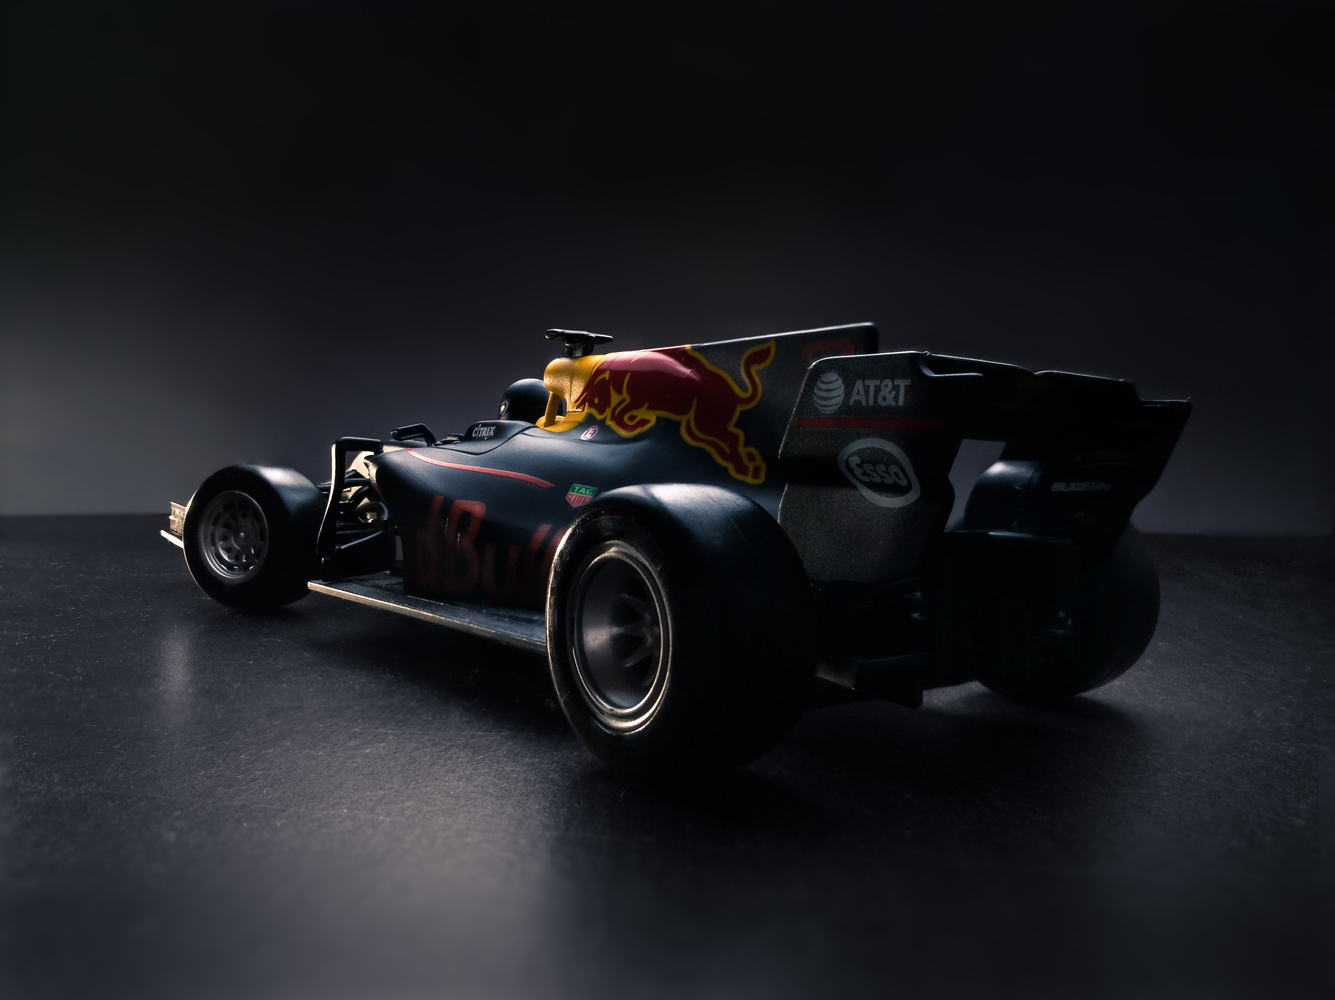 Red Bull RB13 by Vasile Godiciu